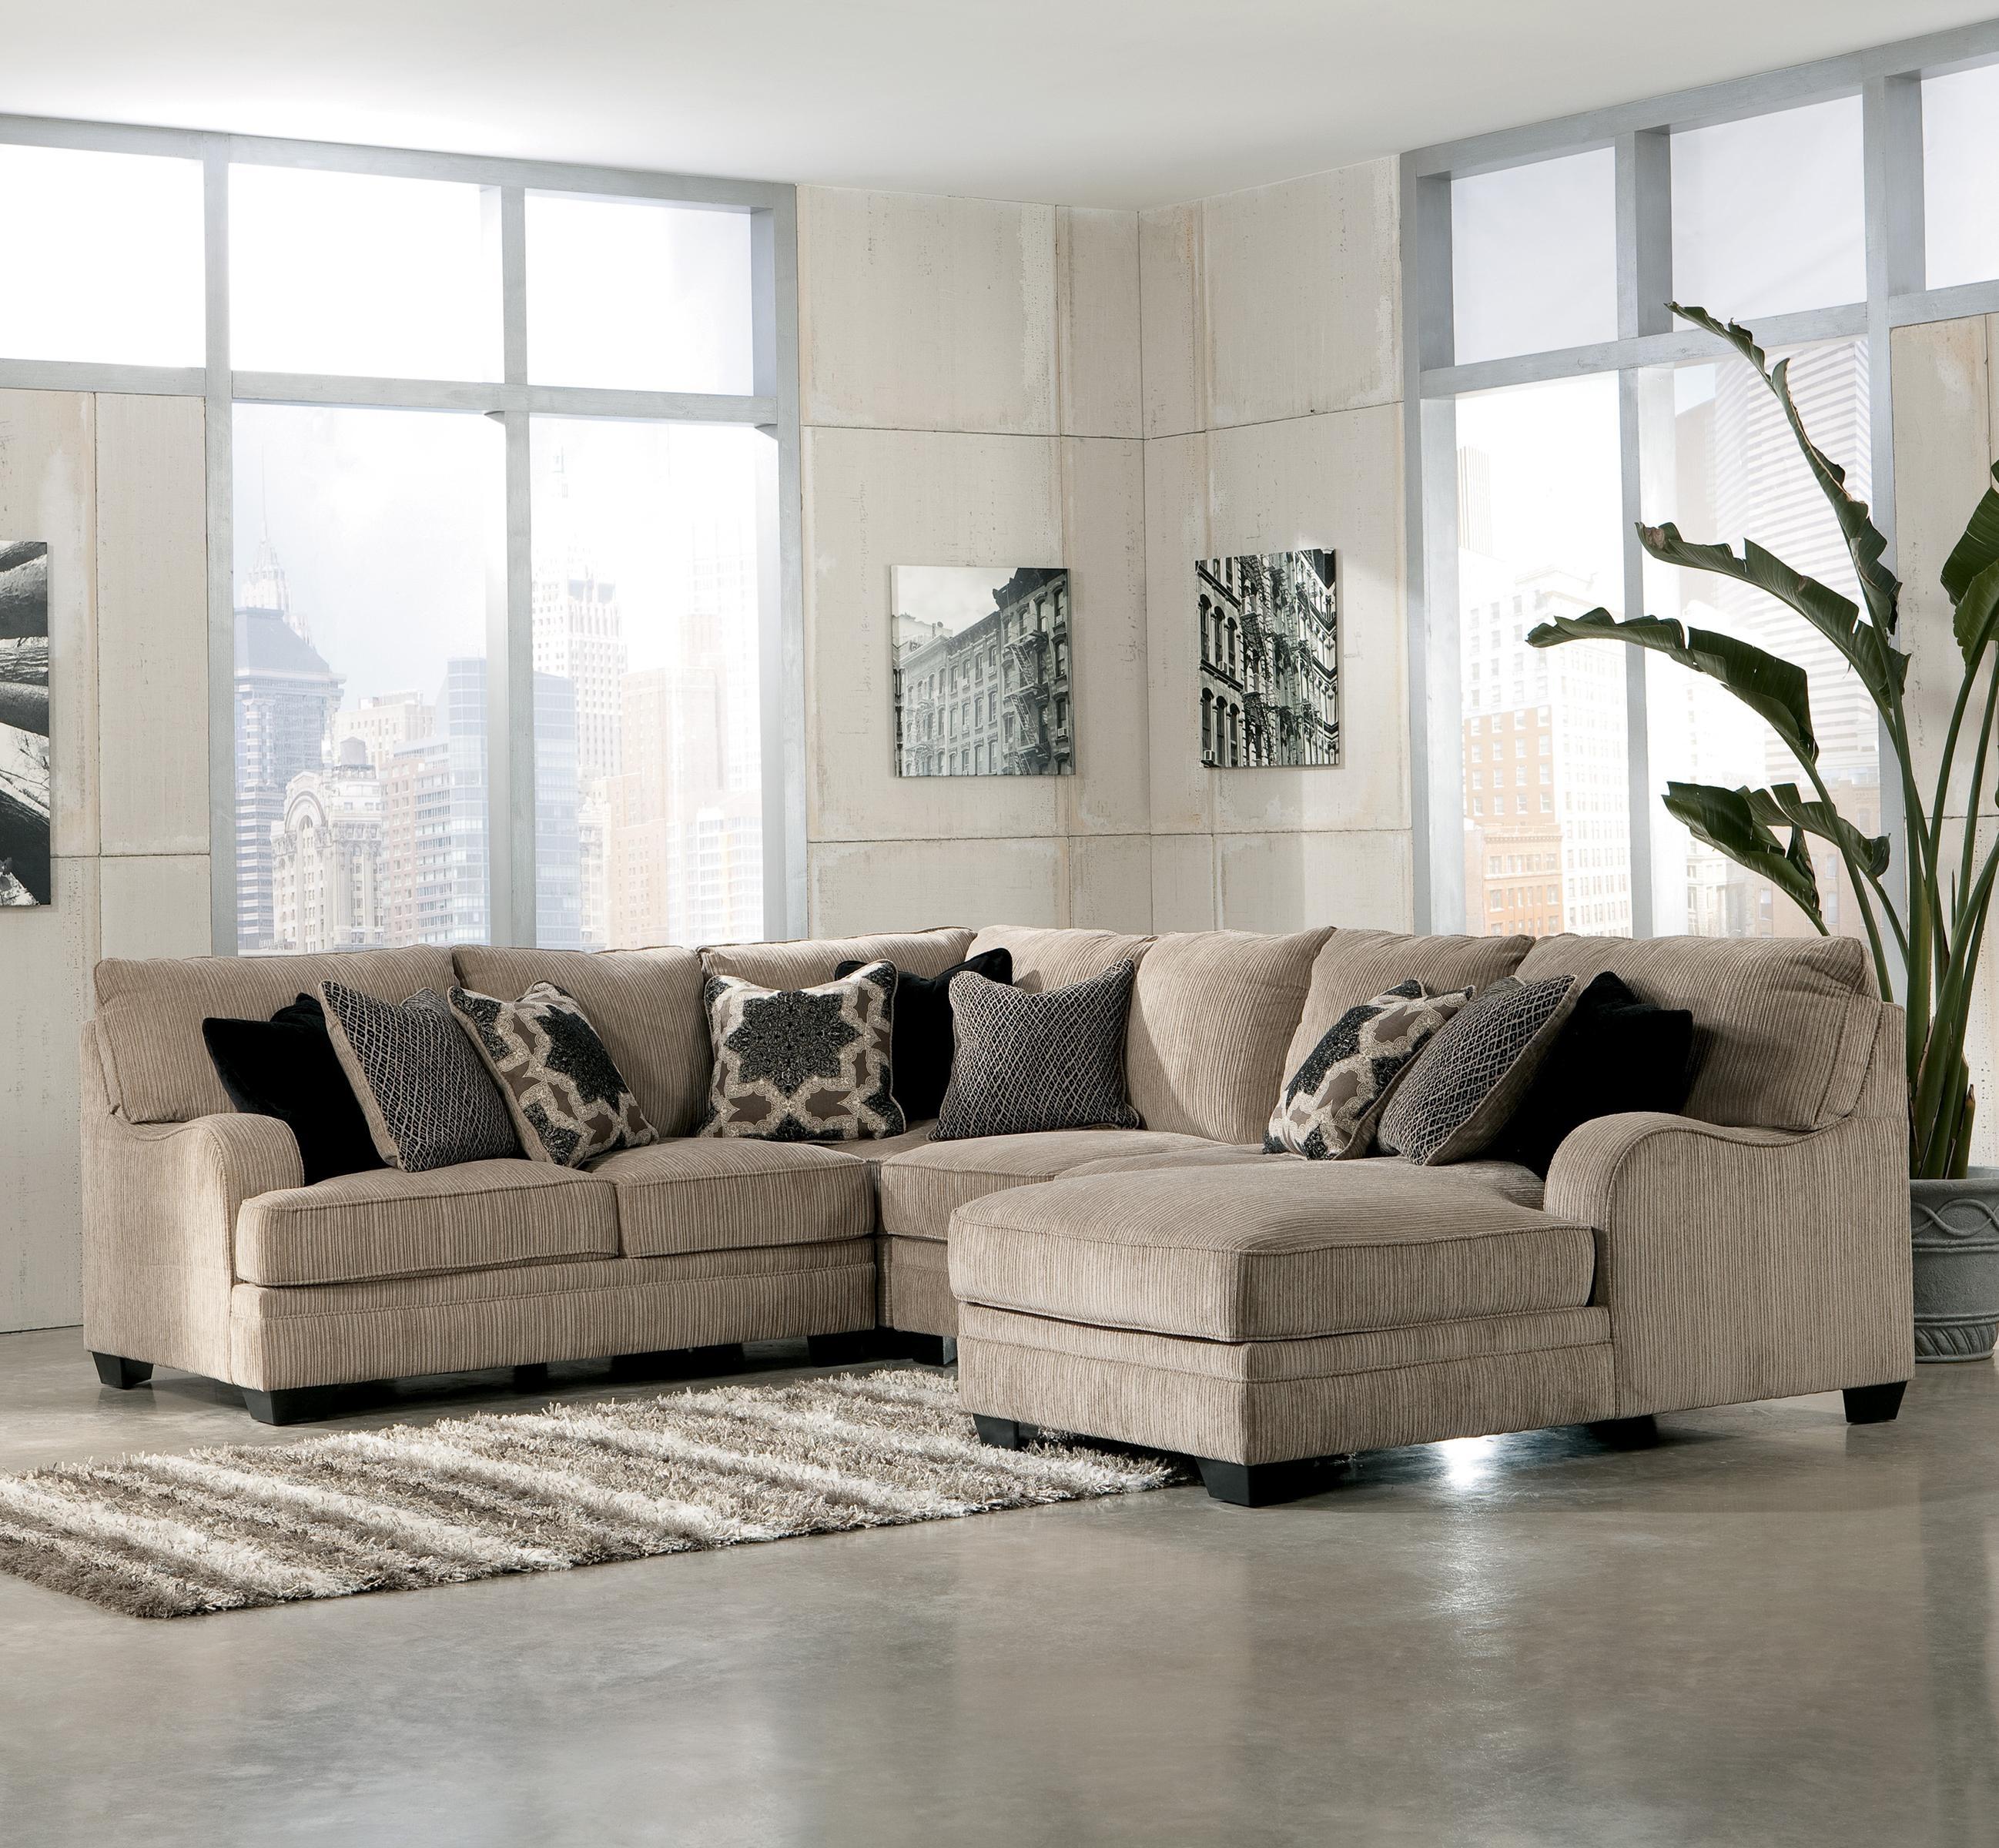 Signature Designashley Katisha - Platinum 4-Piece Sectional Sofa intended for Blaine 4 Piece Sectionals (Image 24 of 30)